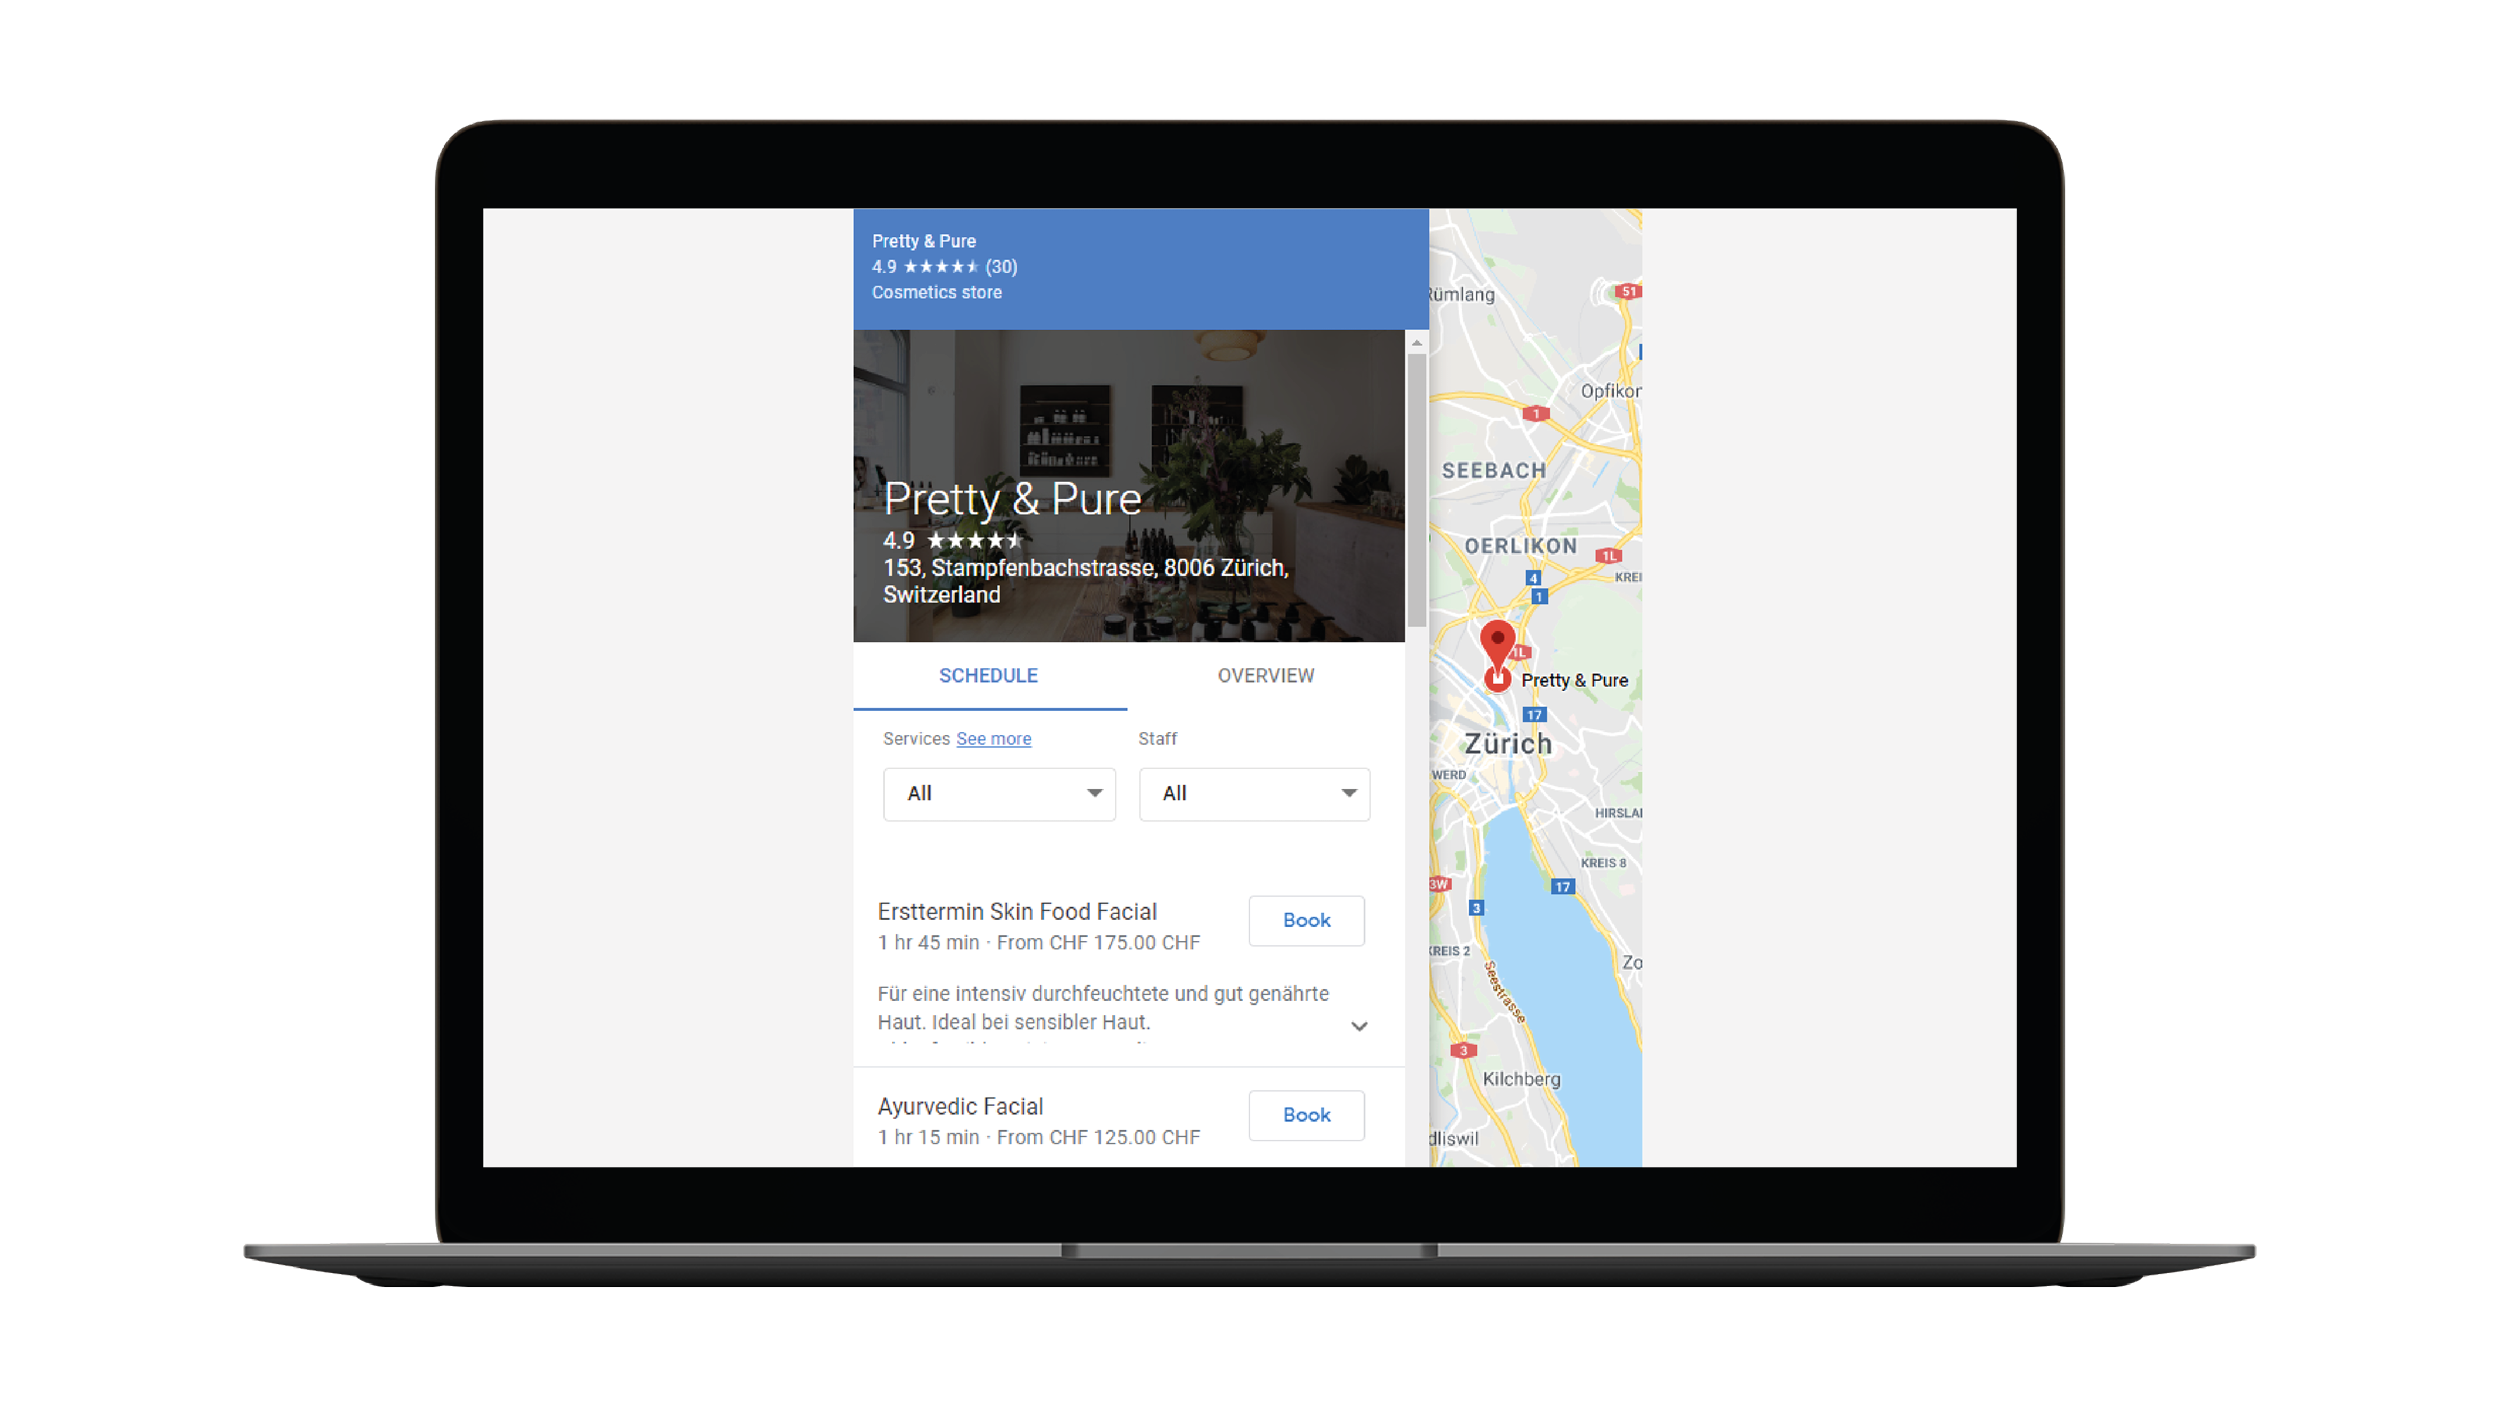 image 2 google my business